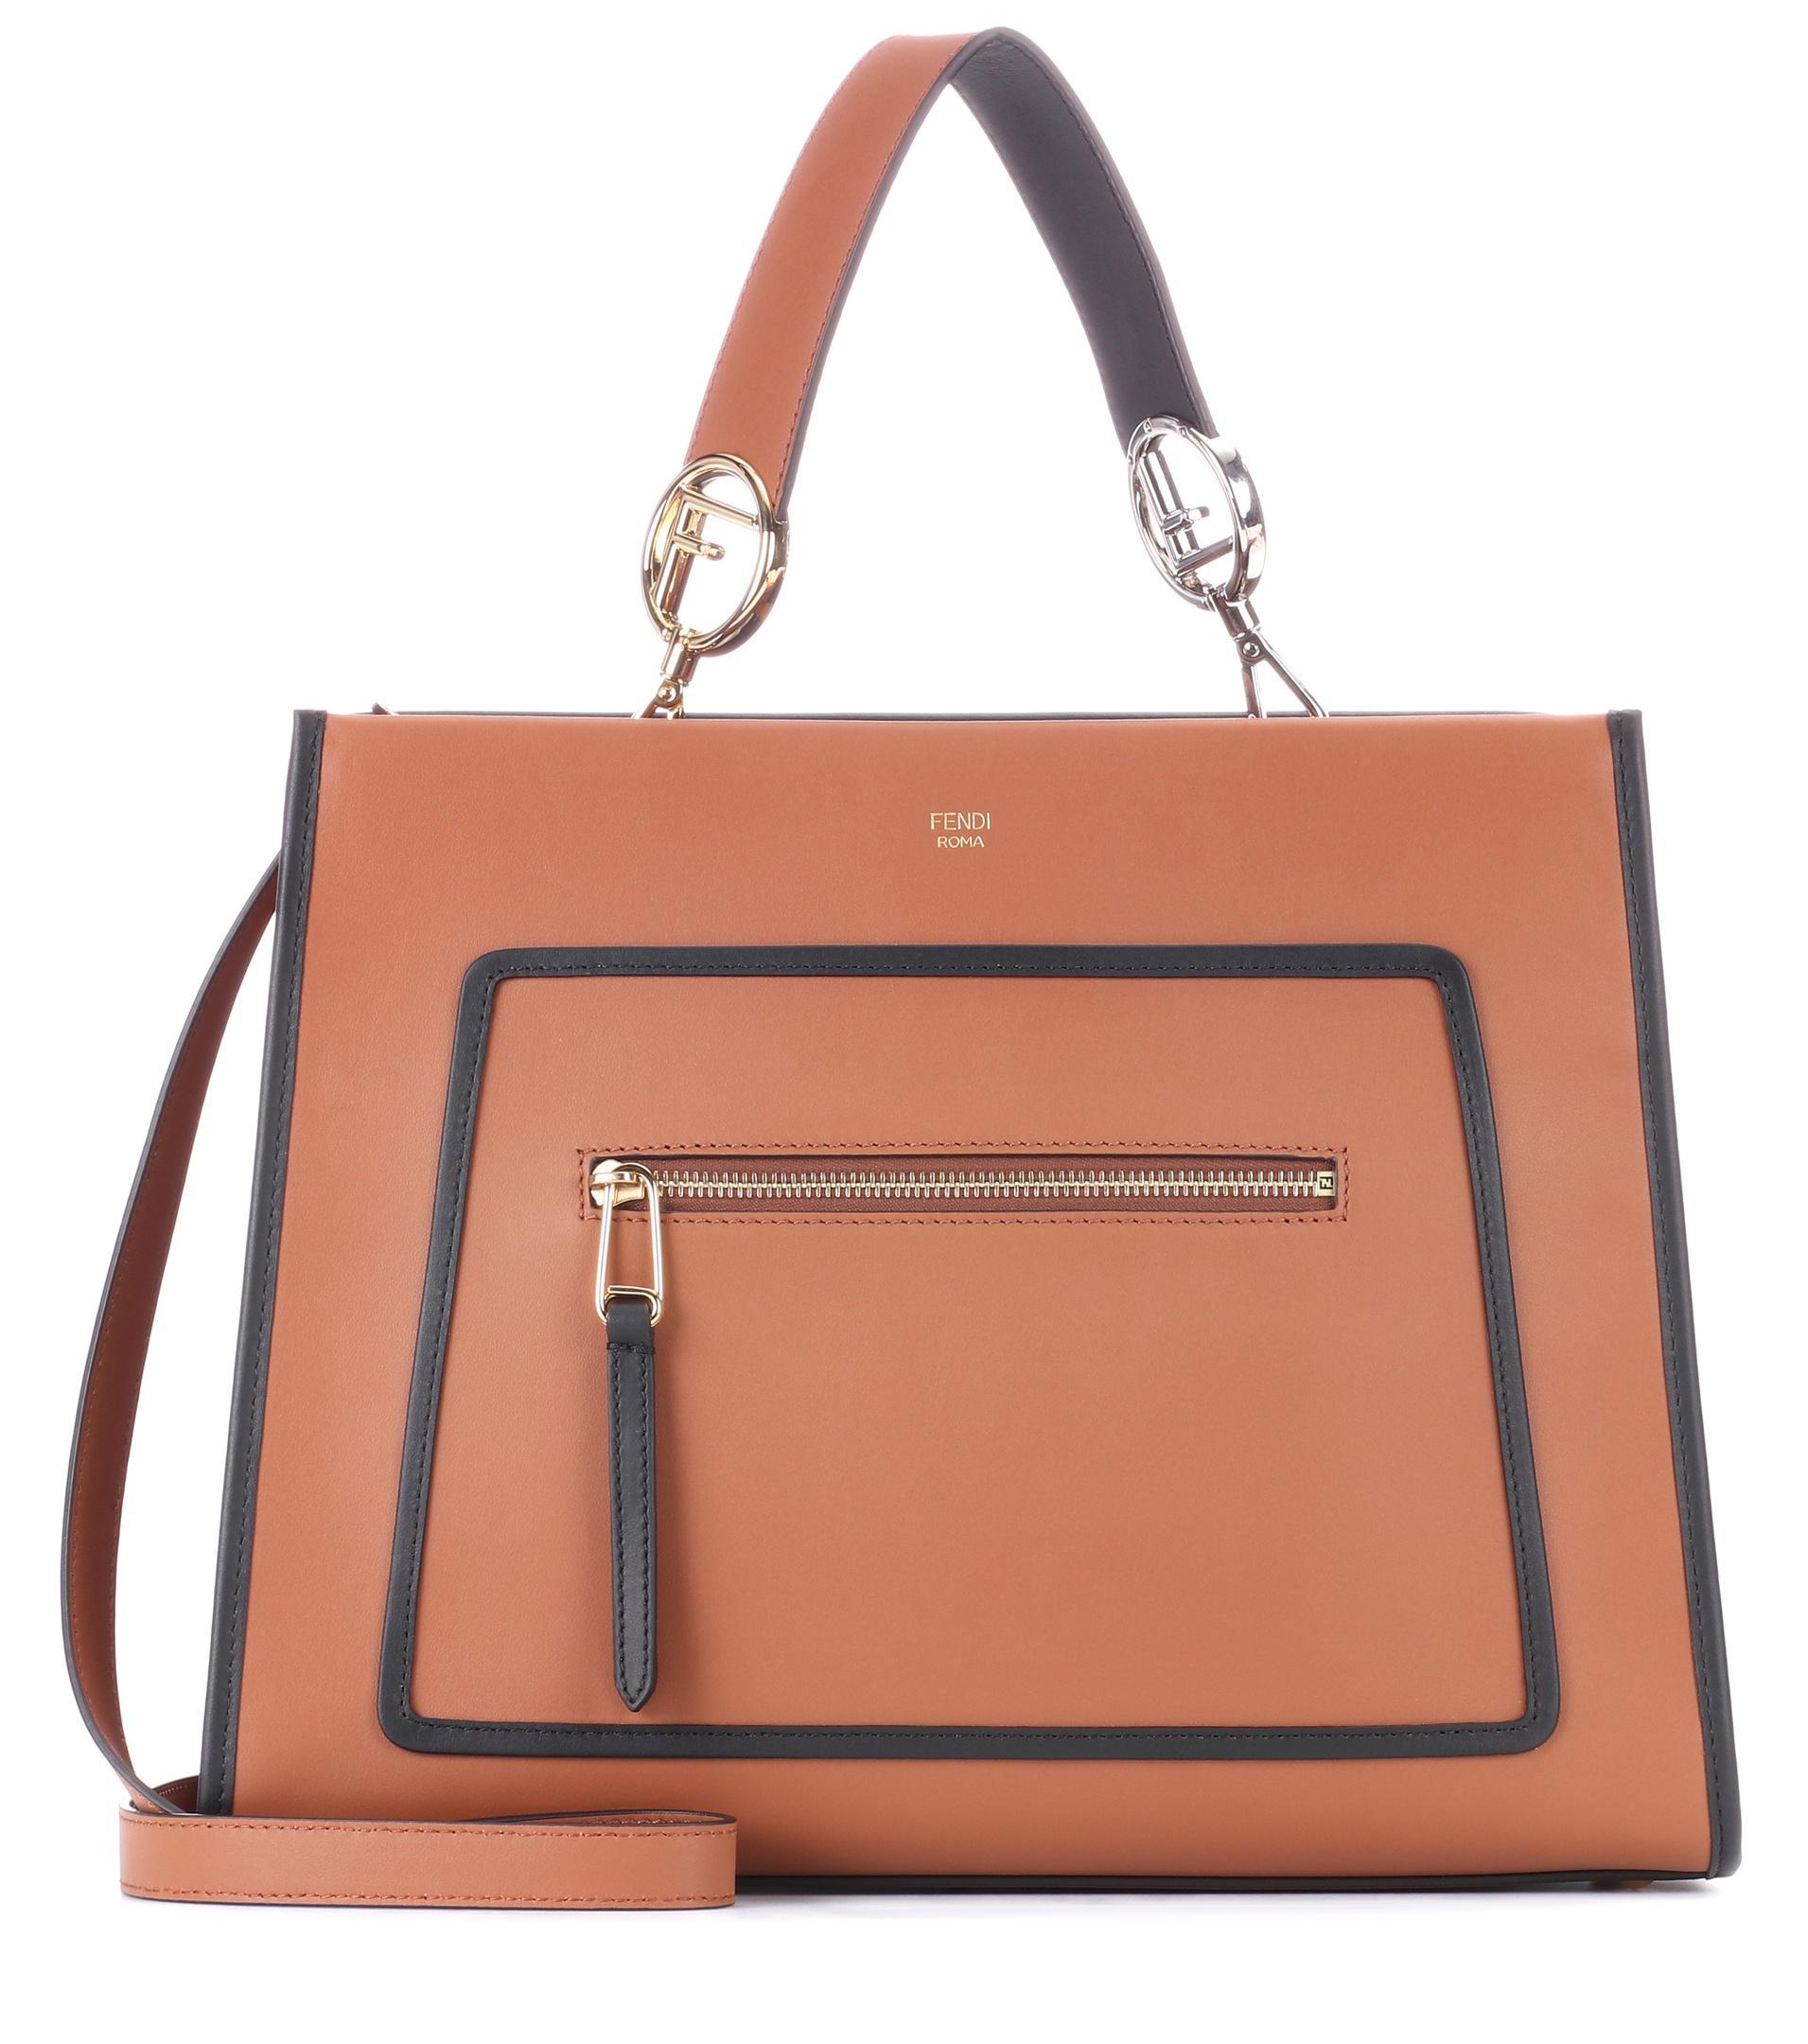 b14556dde641 Fendi Runway Small Leather Shoulder Bag in Brown - Lyst